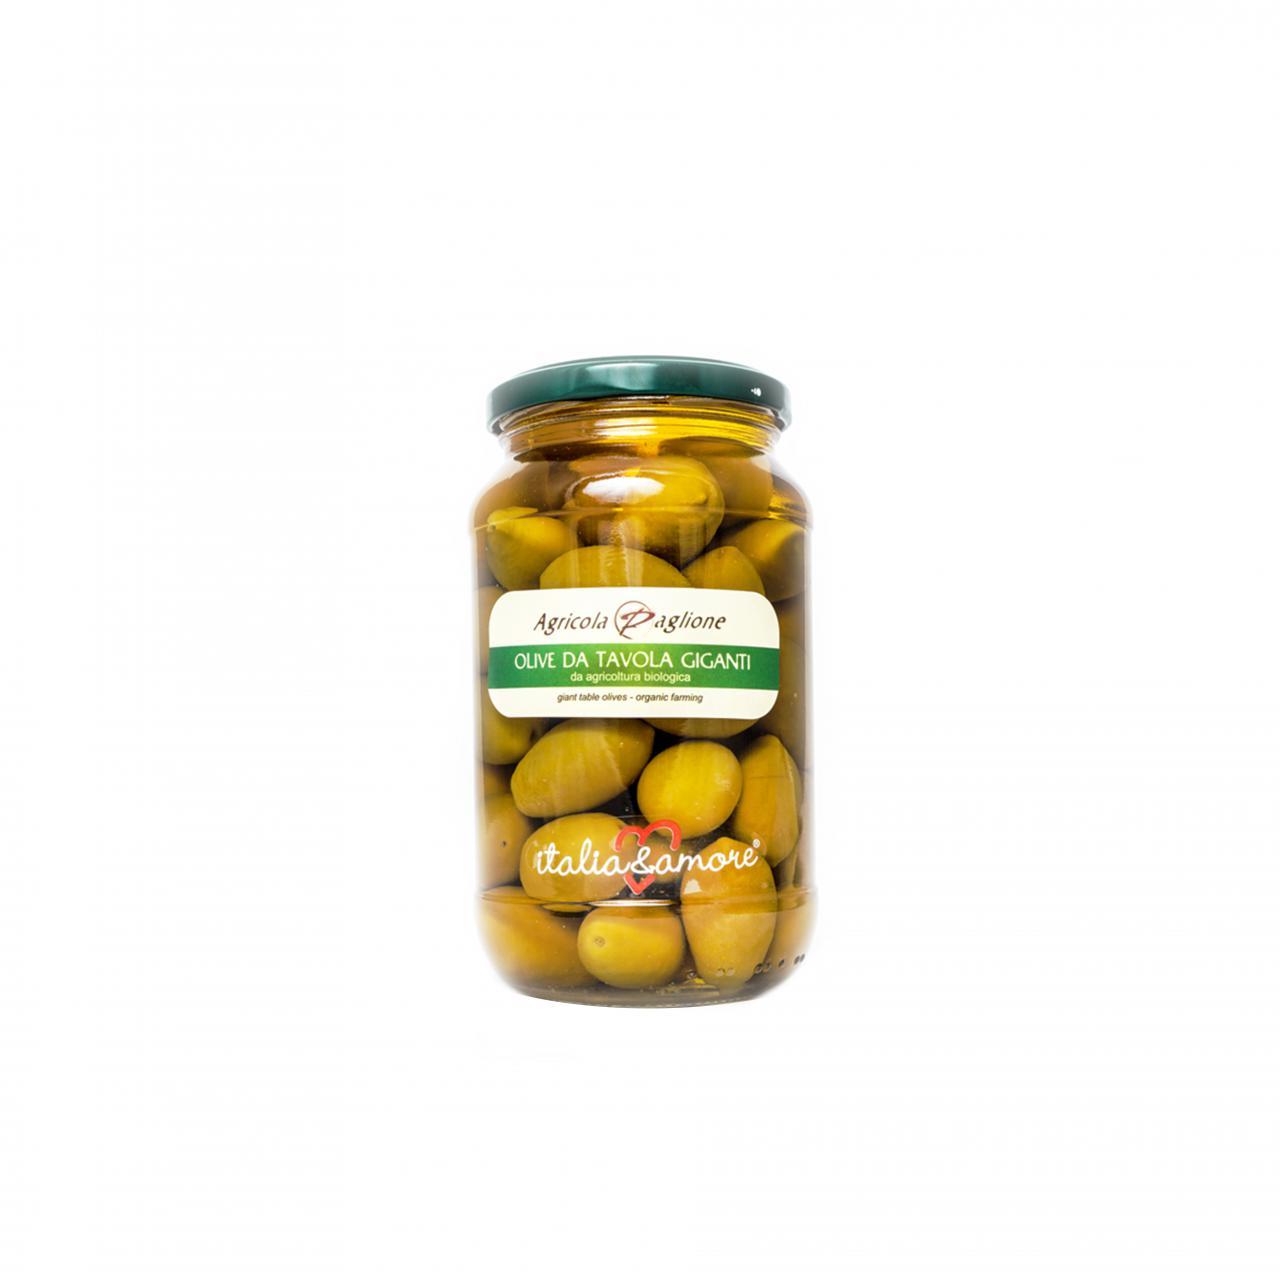 Olive de Tavola Giganti